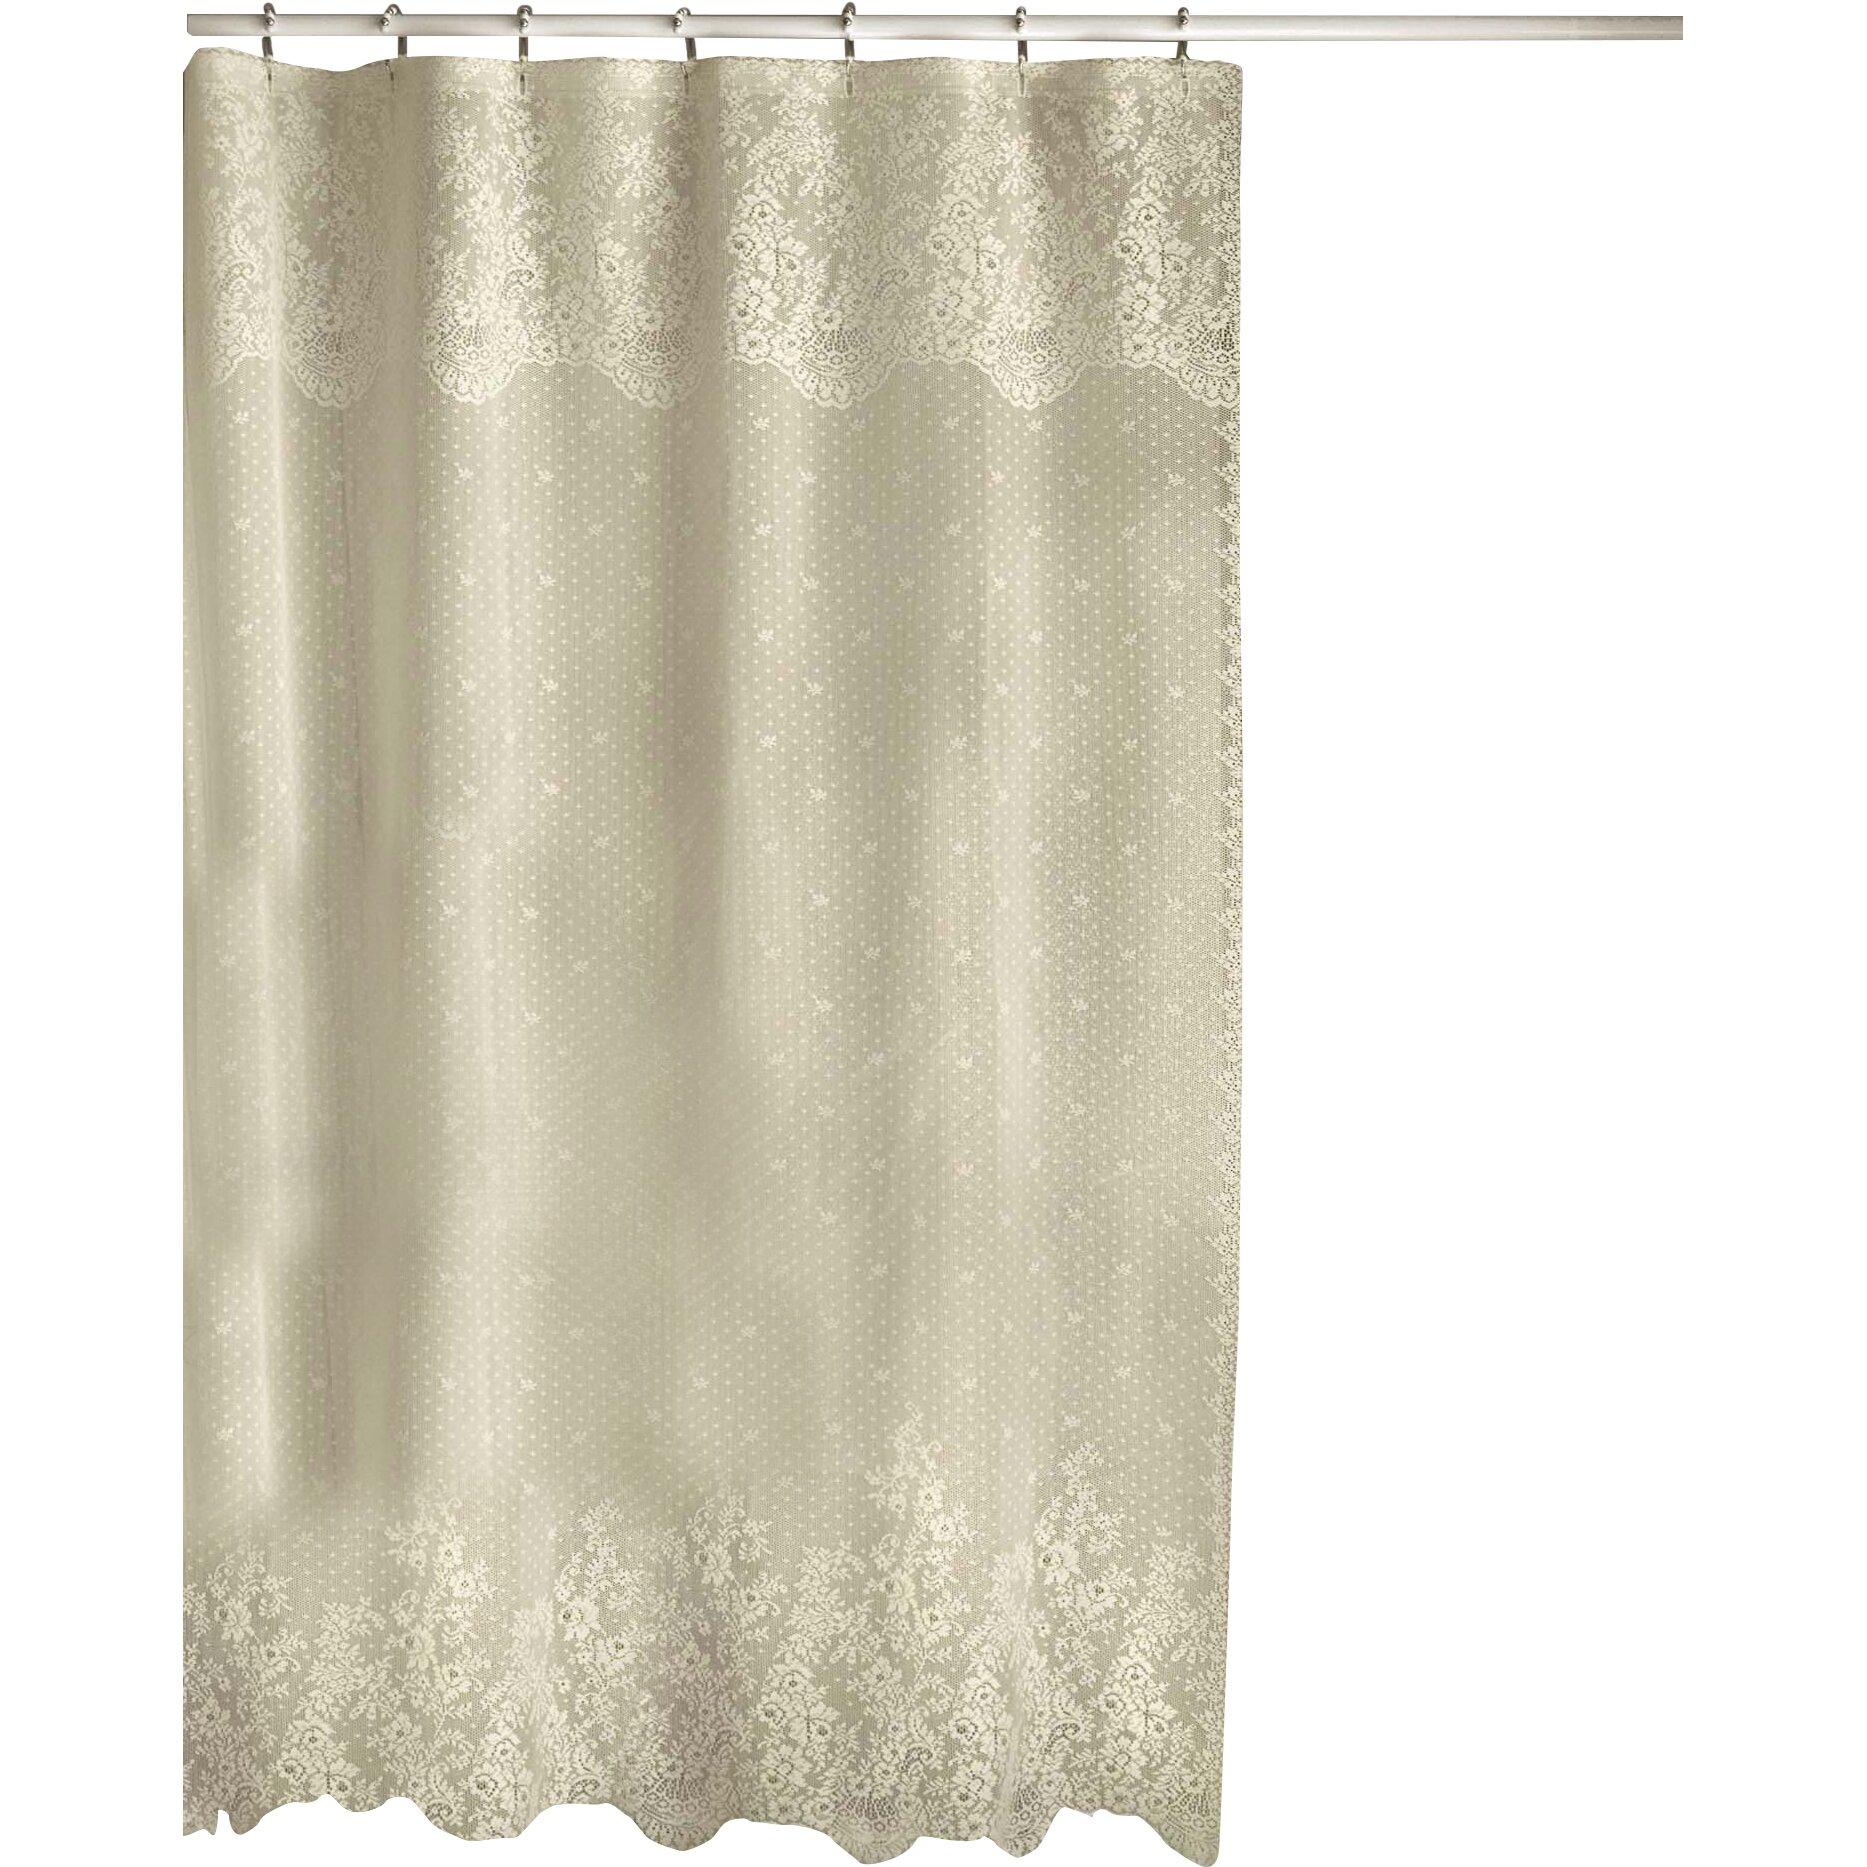 Astoria Grand Victor Shower Curtain  Reviews Wayfair - Shower curtain